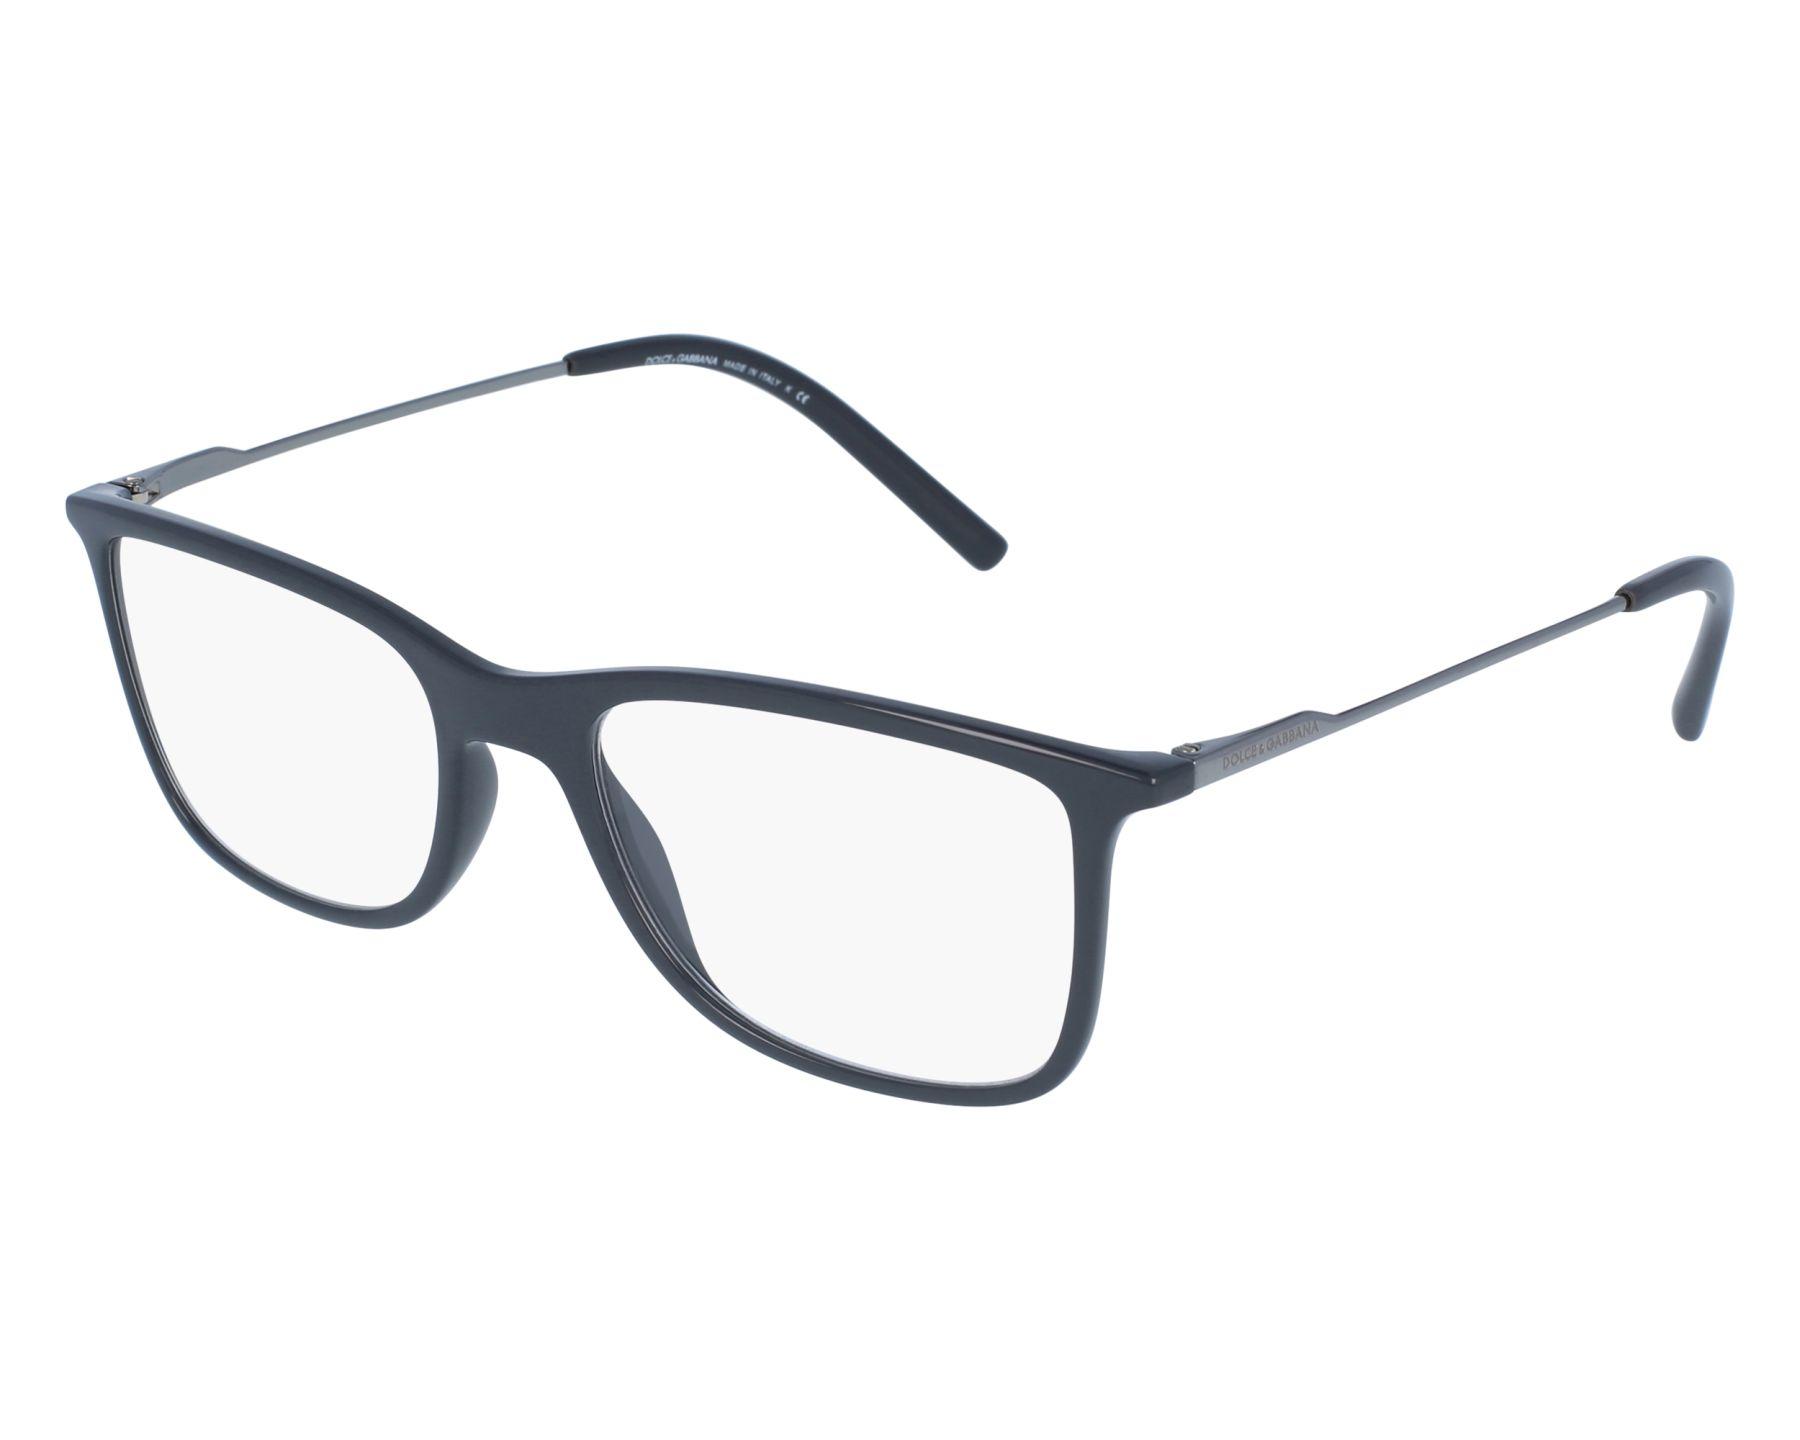 379fcbd3c322 eyeglasses Dolce & Gabbana DG-5024 3101 - Grey Gun front view